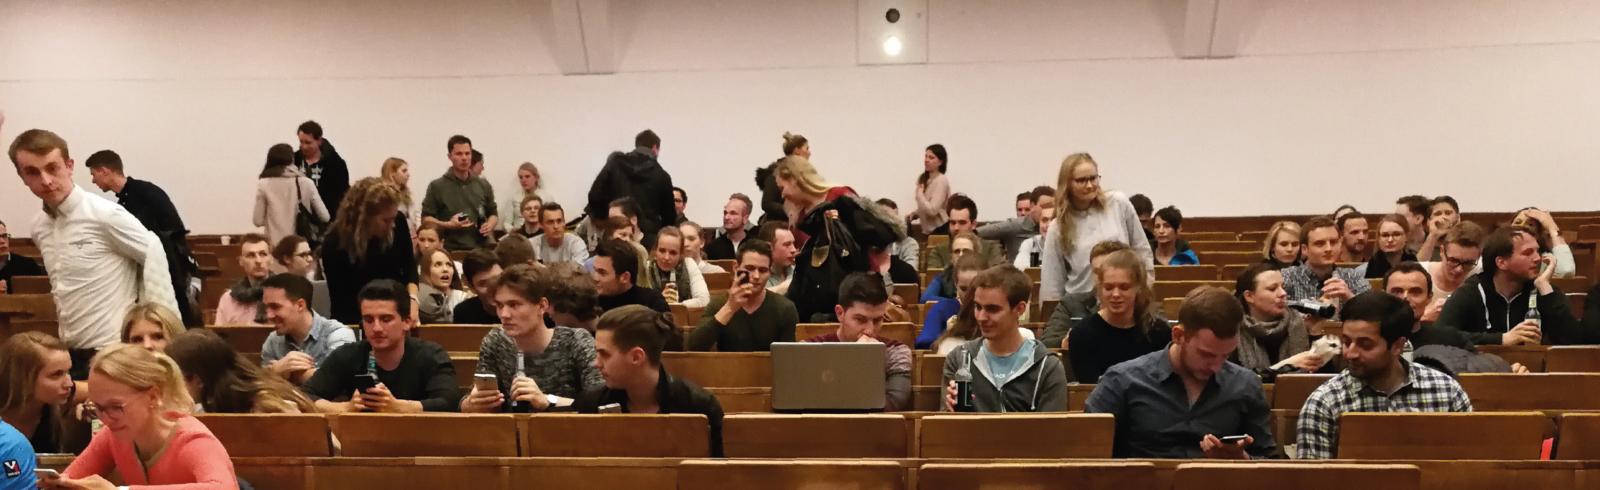 Studenten in Münster lieben liba